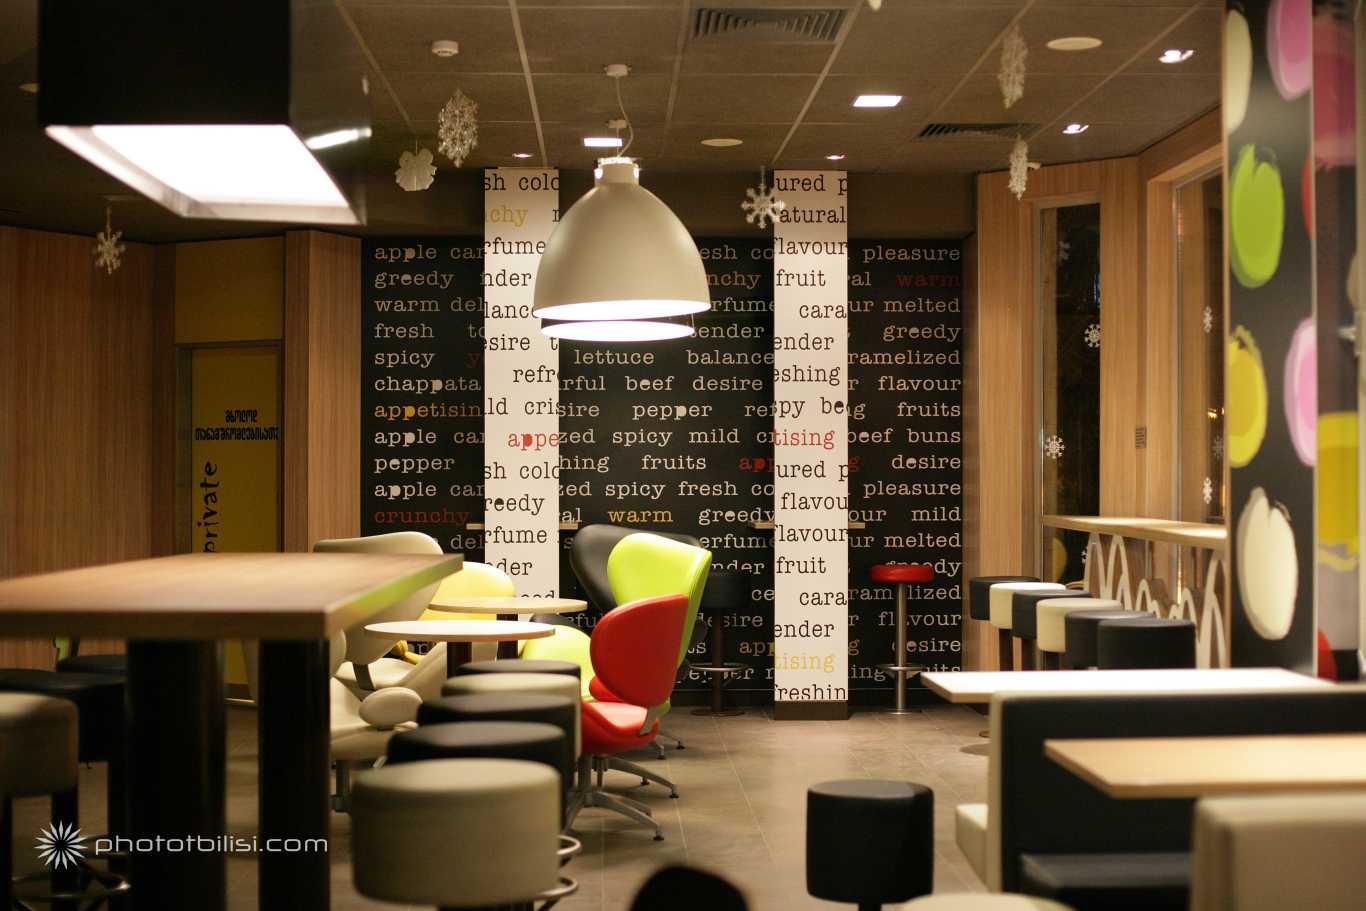 Interiors-Design-Stiil-Life-Alex-Wed-Tbilisi-7